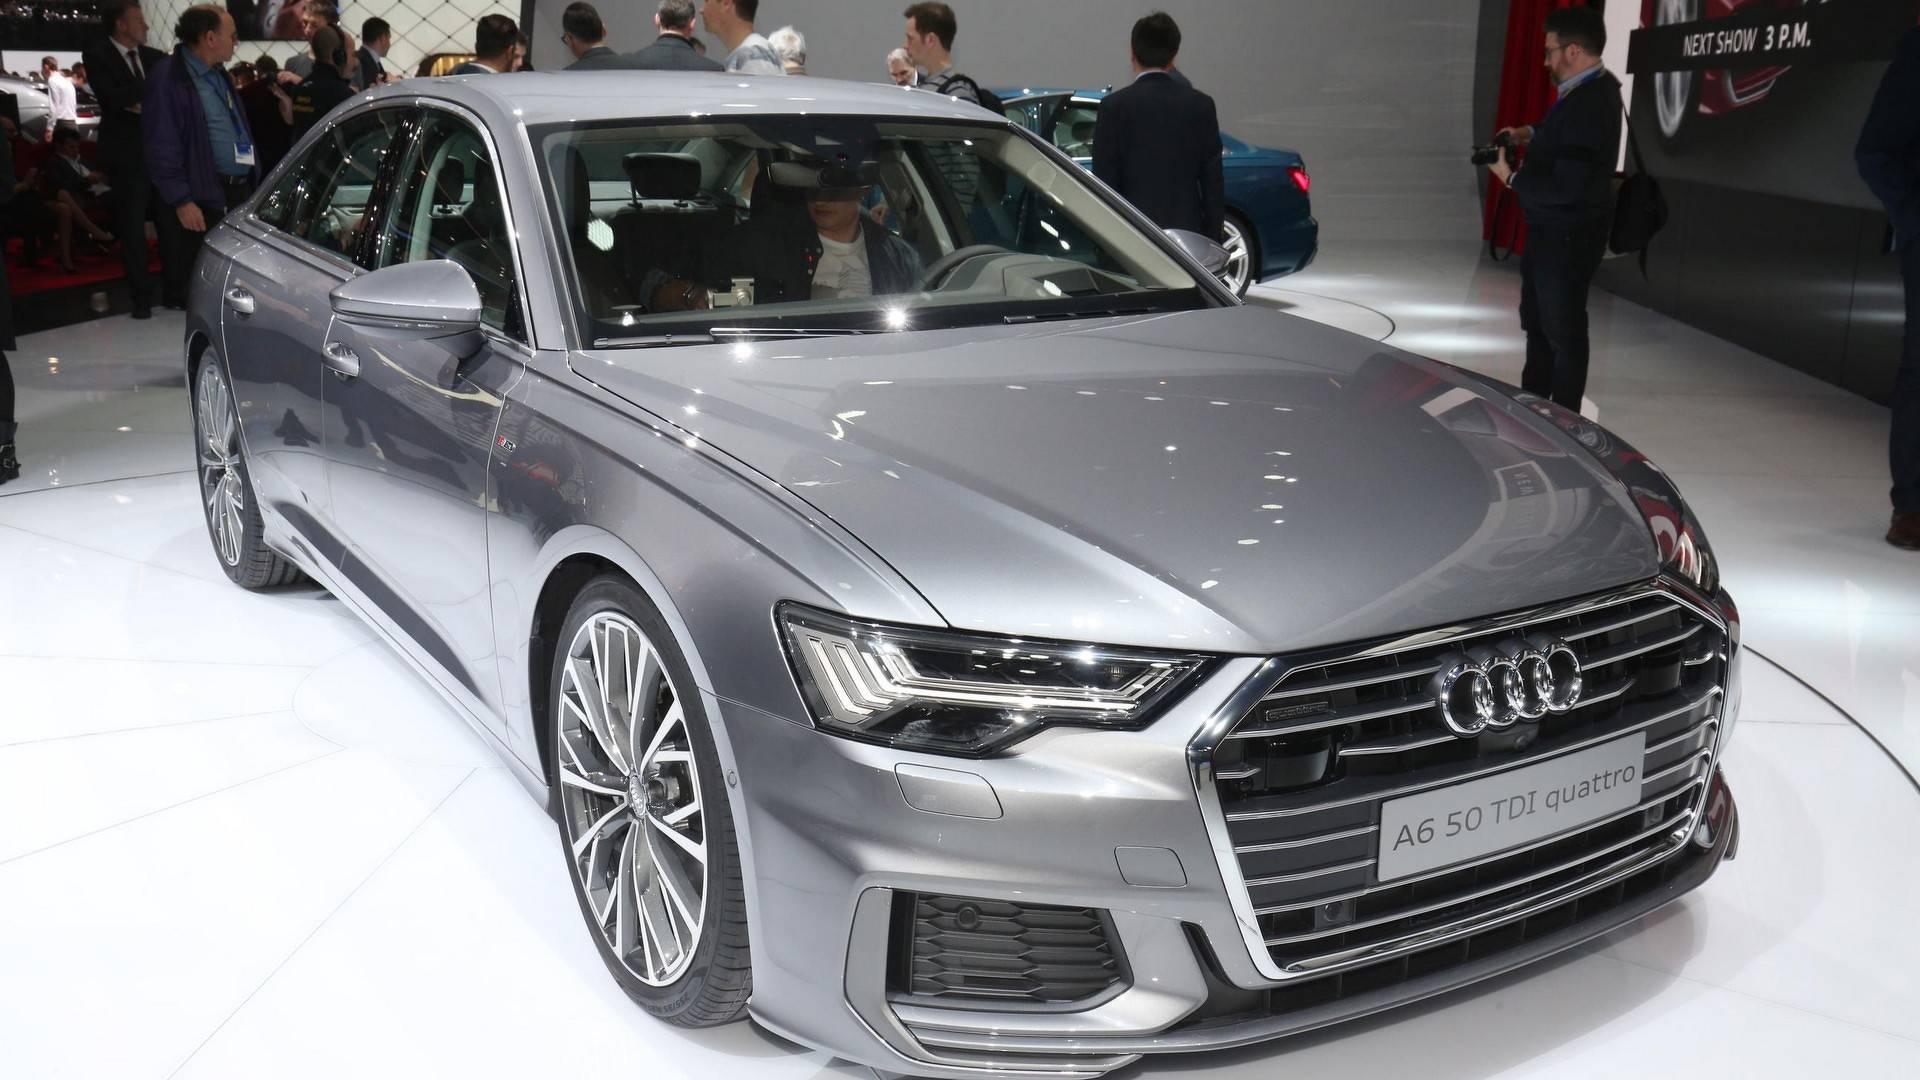 Kelebihan Kekurangan Audi A6 2019 Murah Berkualitas